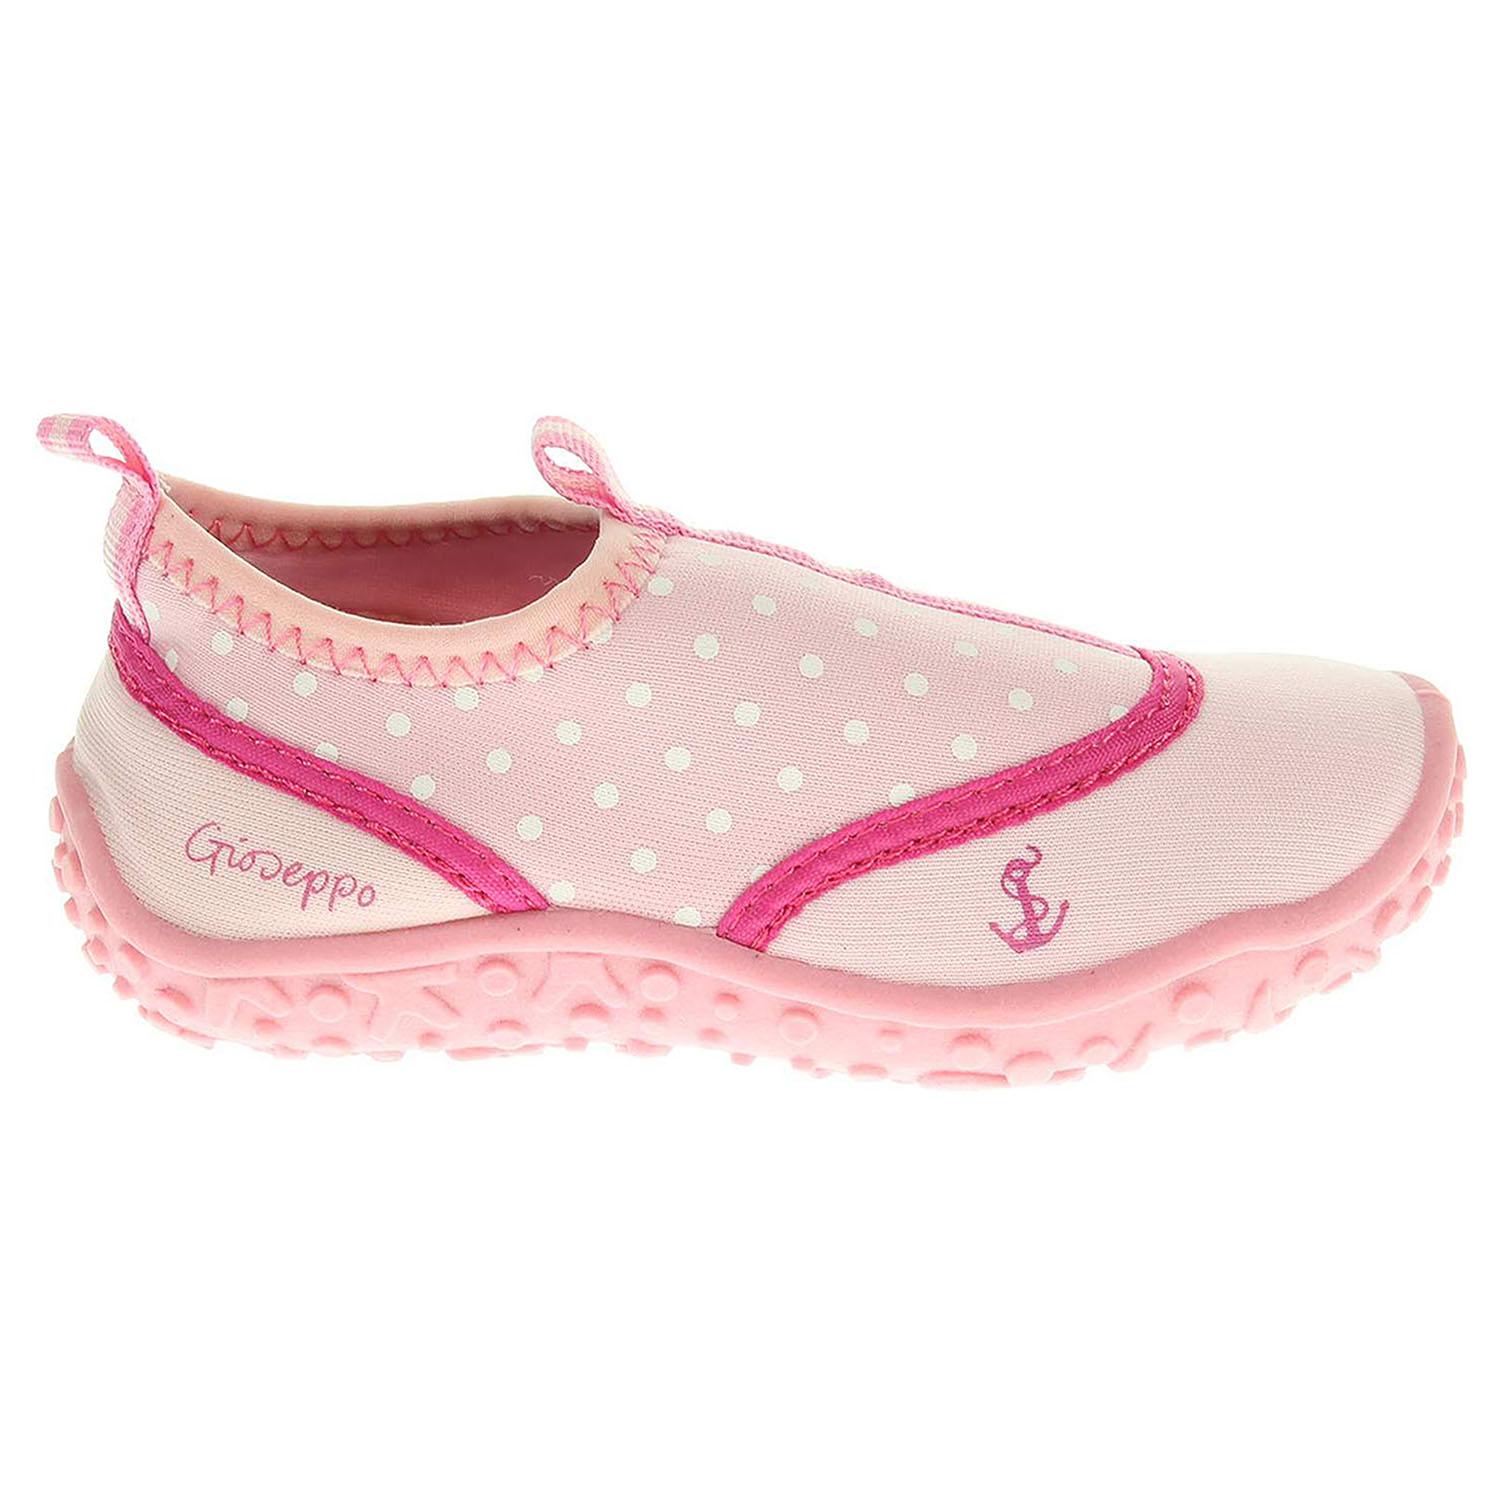 Gioseppo Mesina pink dívčí obuv do vody 23 růžová růžová